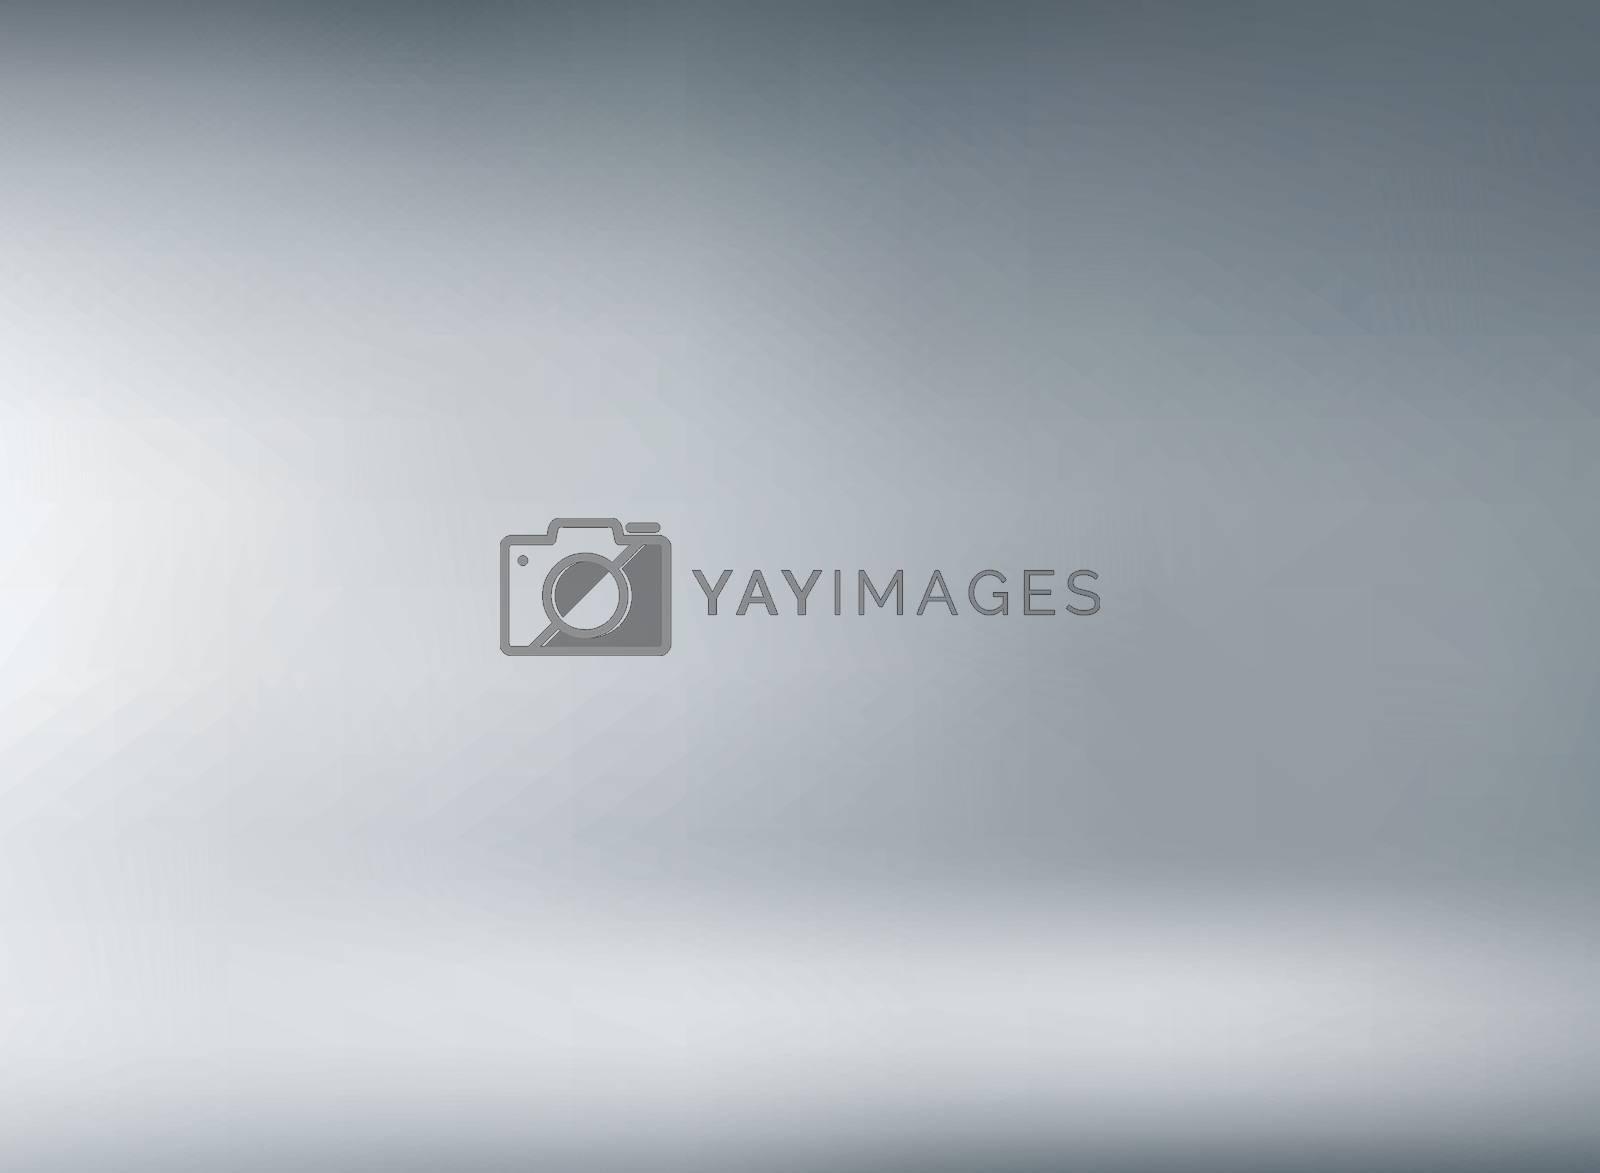 Studio room gray background with soft lighting. You can use for design print, brochure, poster, banner, website, Presentation. Vector illustration